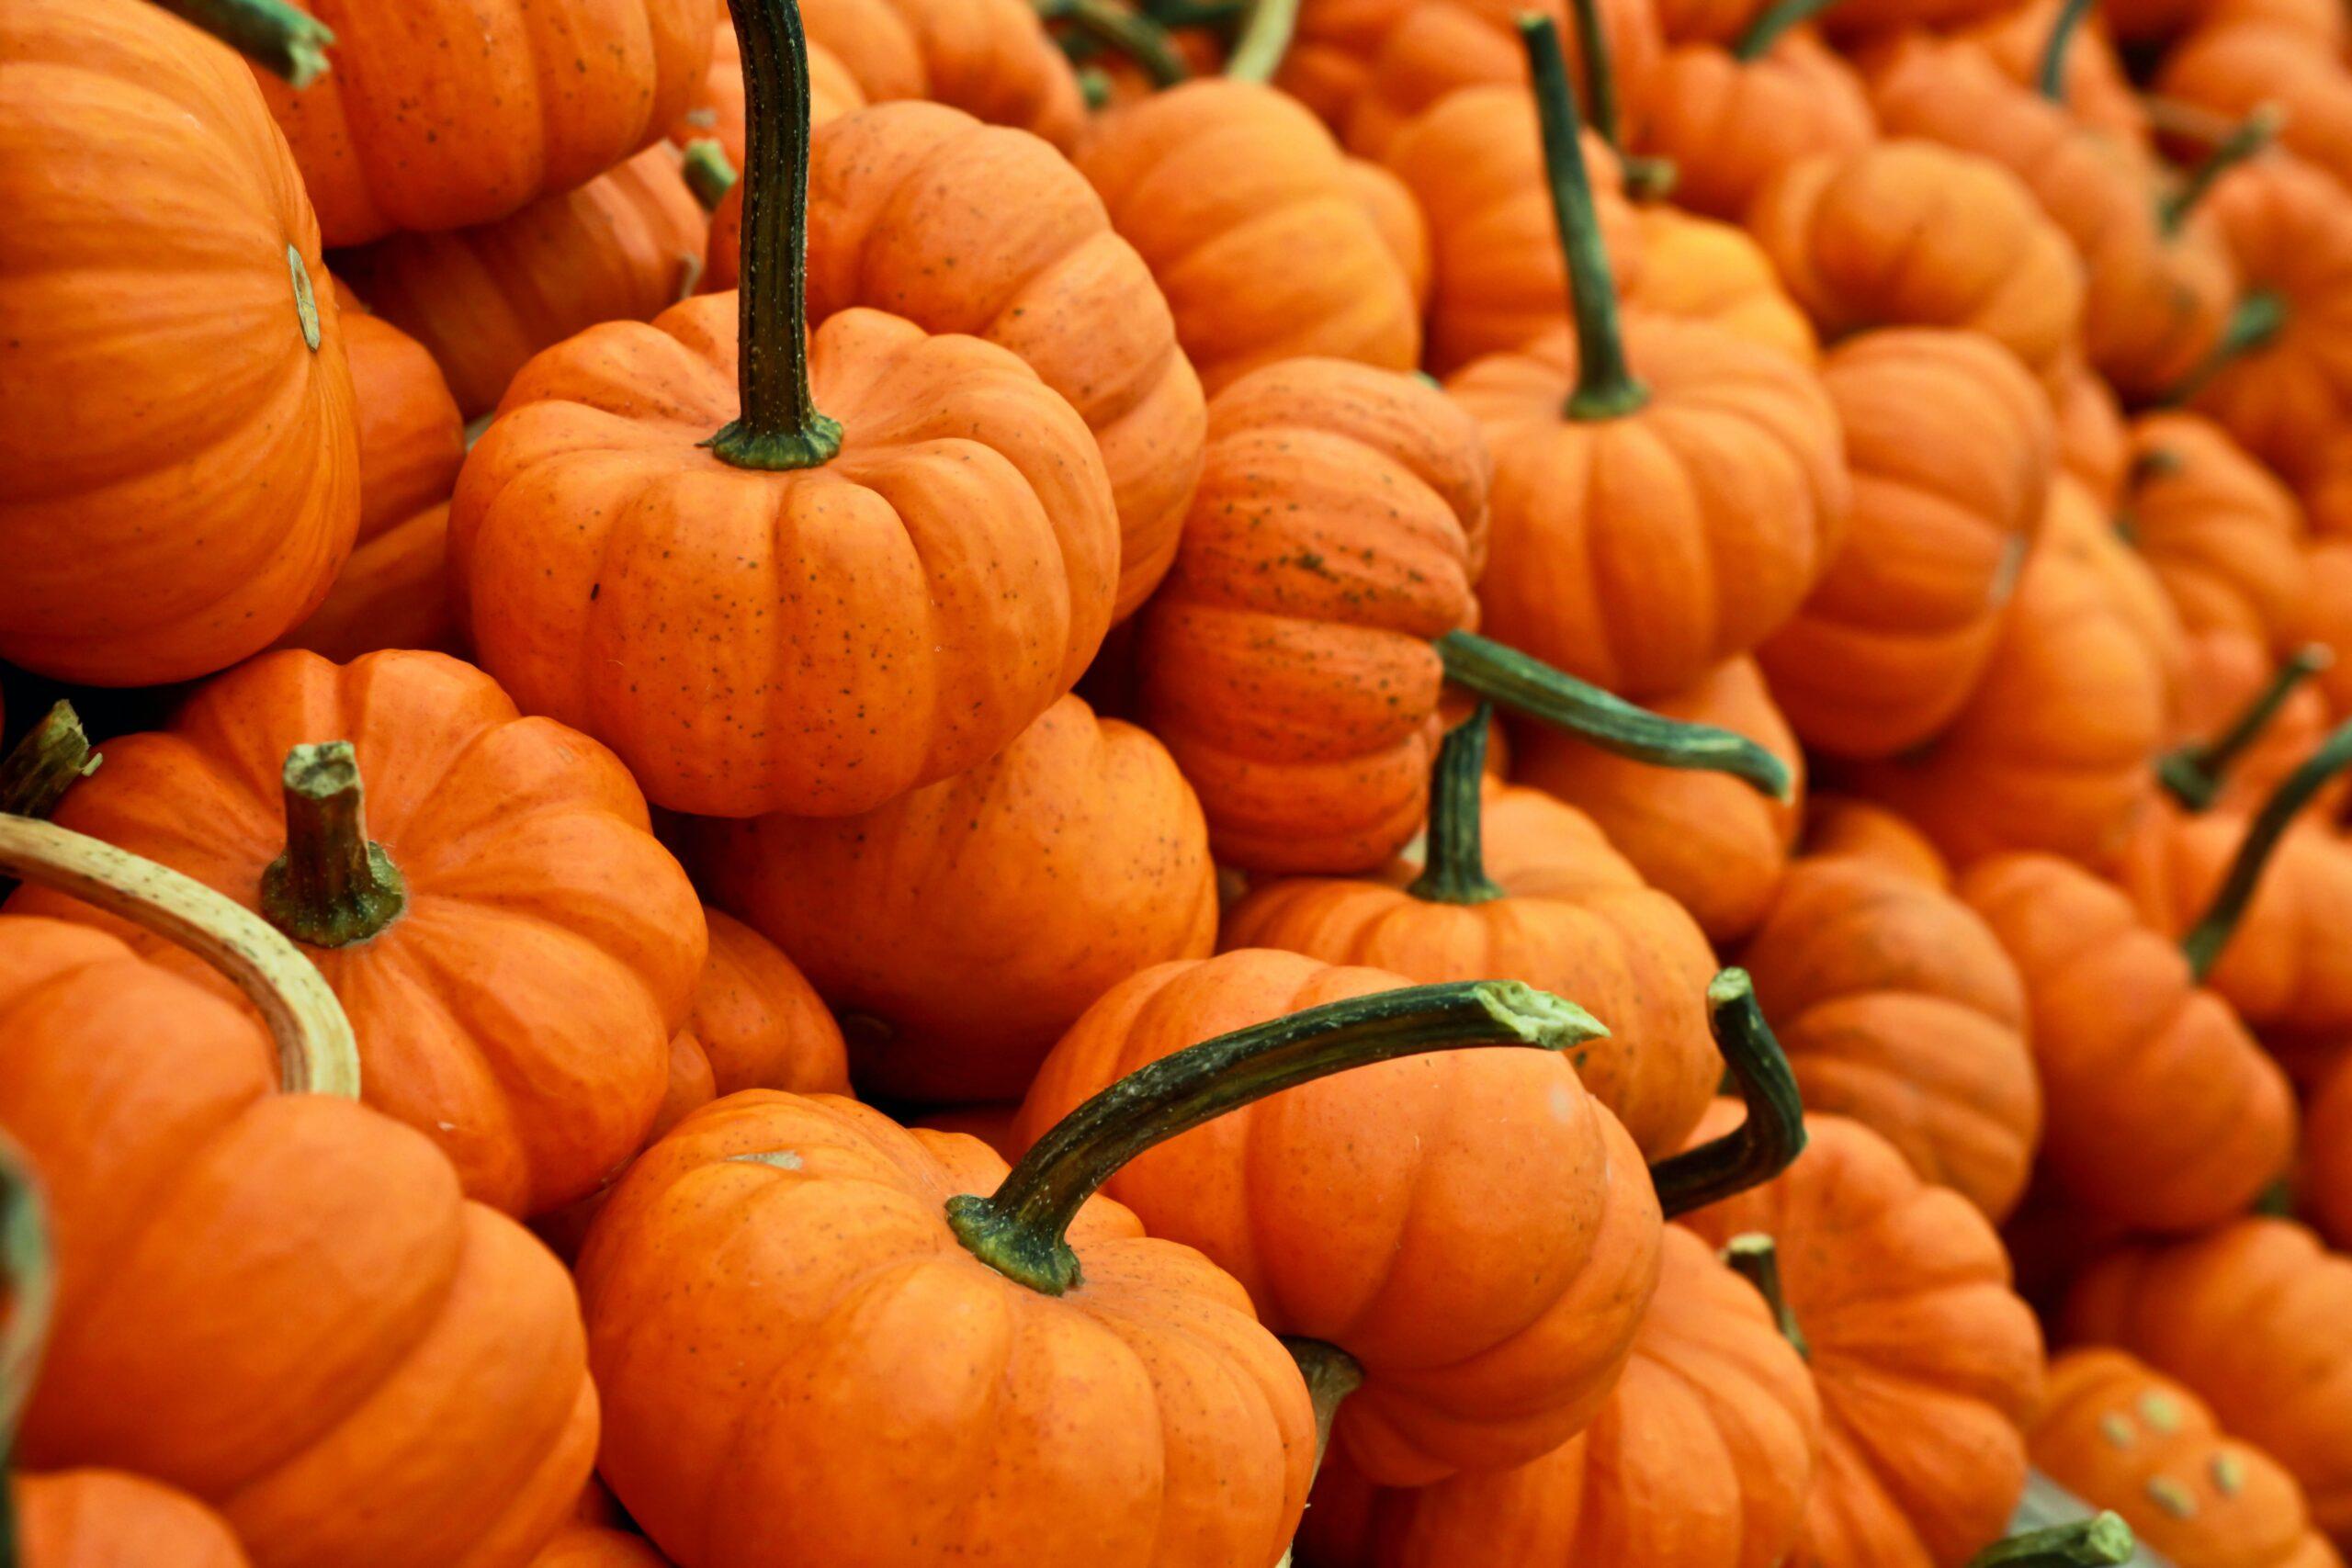 Pumpkin growers harvest